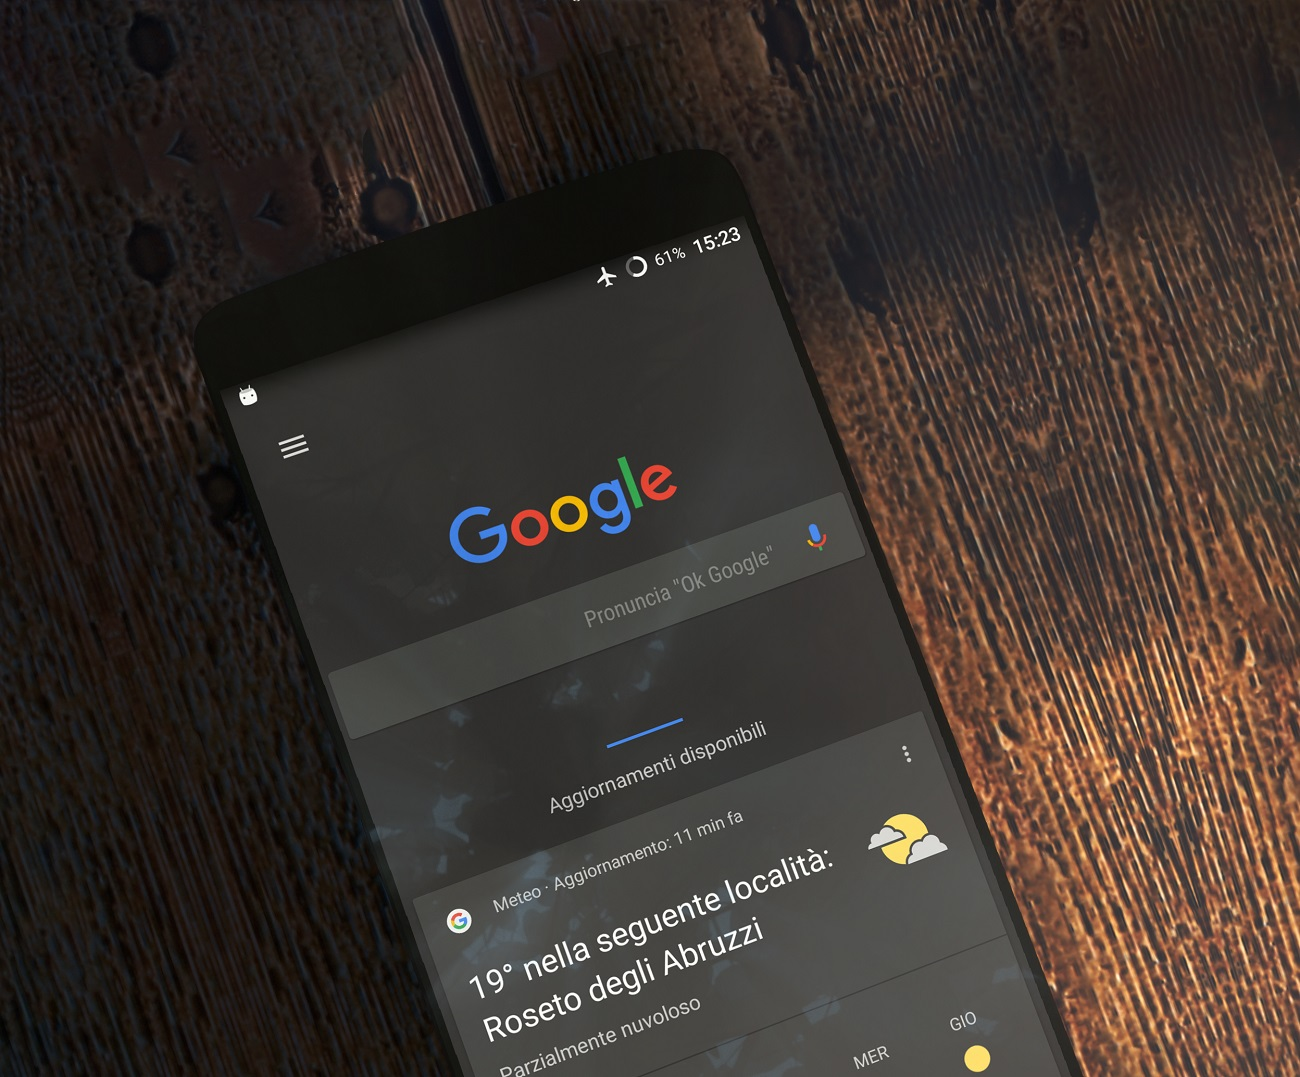 google-dark-mode-battery-save-news